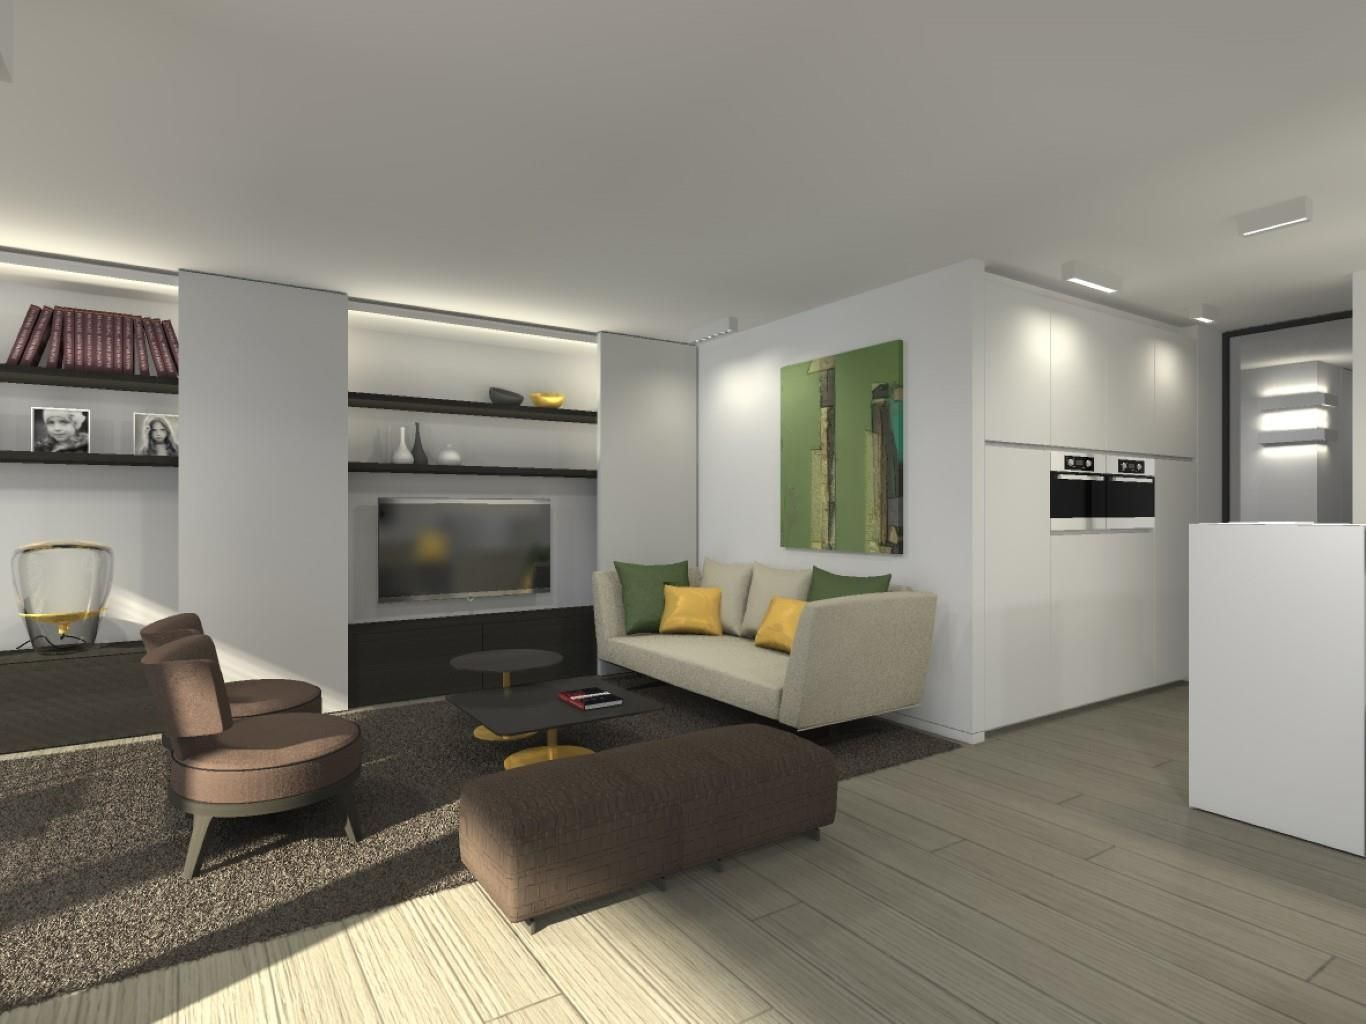 die besten 25 tv paneel wand ideen auf pinterest tv wand pinterest tv wand bauen und tv wand. Black Bedroom Furniture Sets. Home Design Ideas